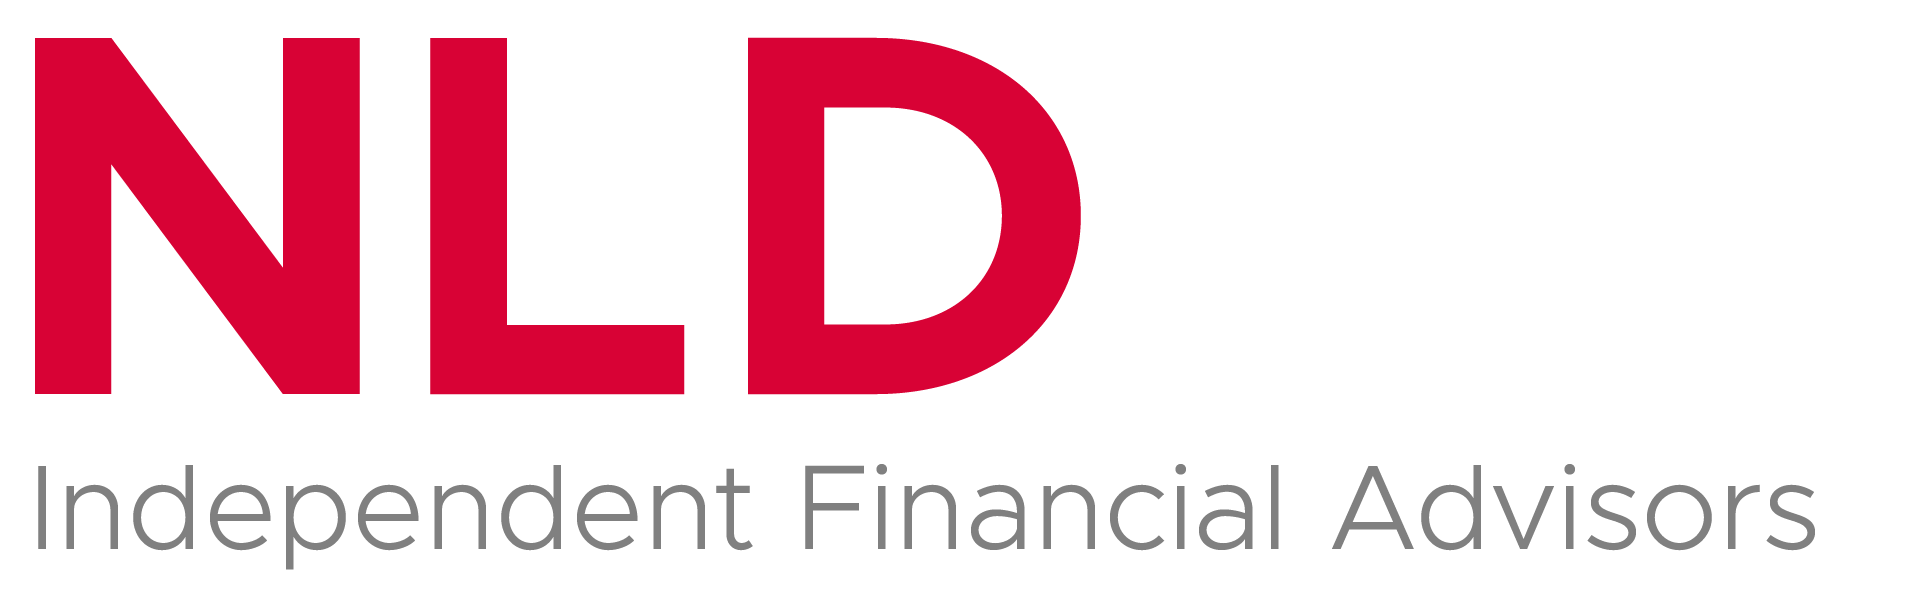 NLD Independent Financial Advisors Logo